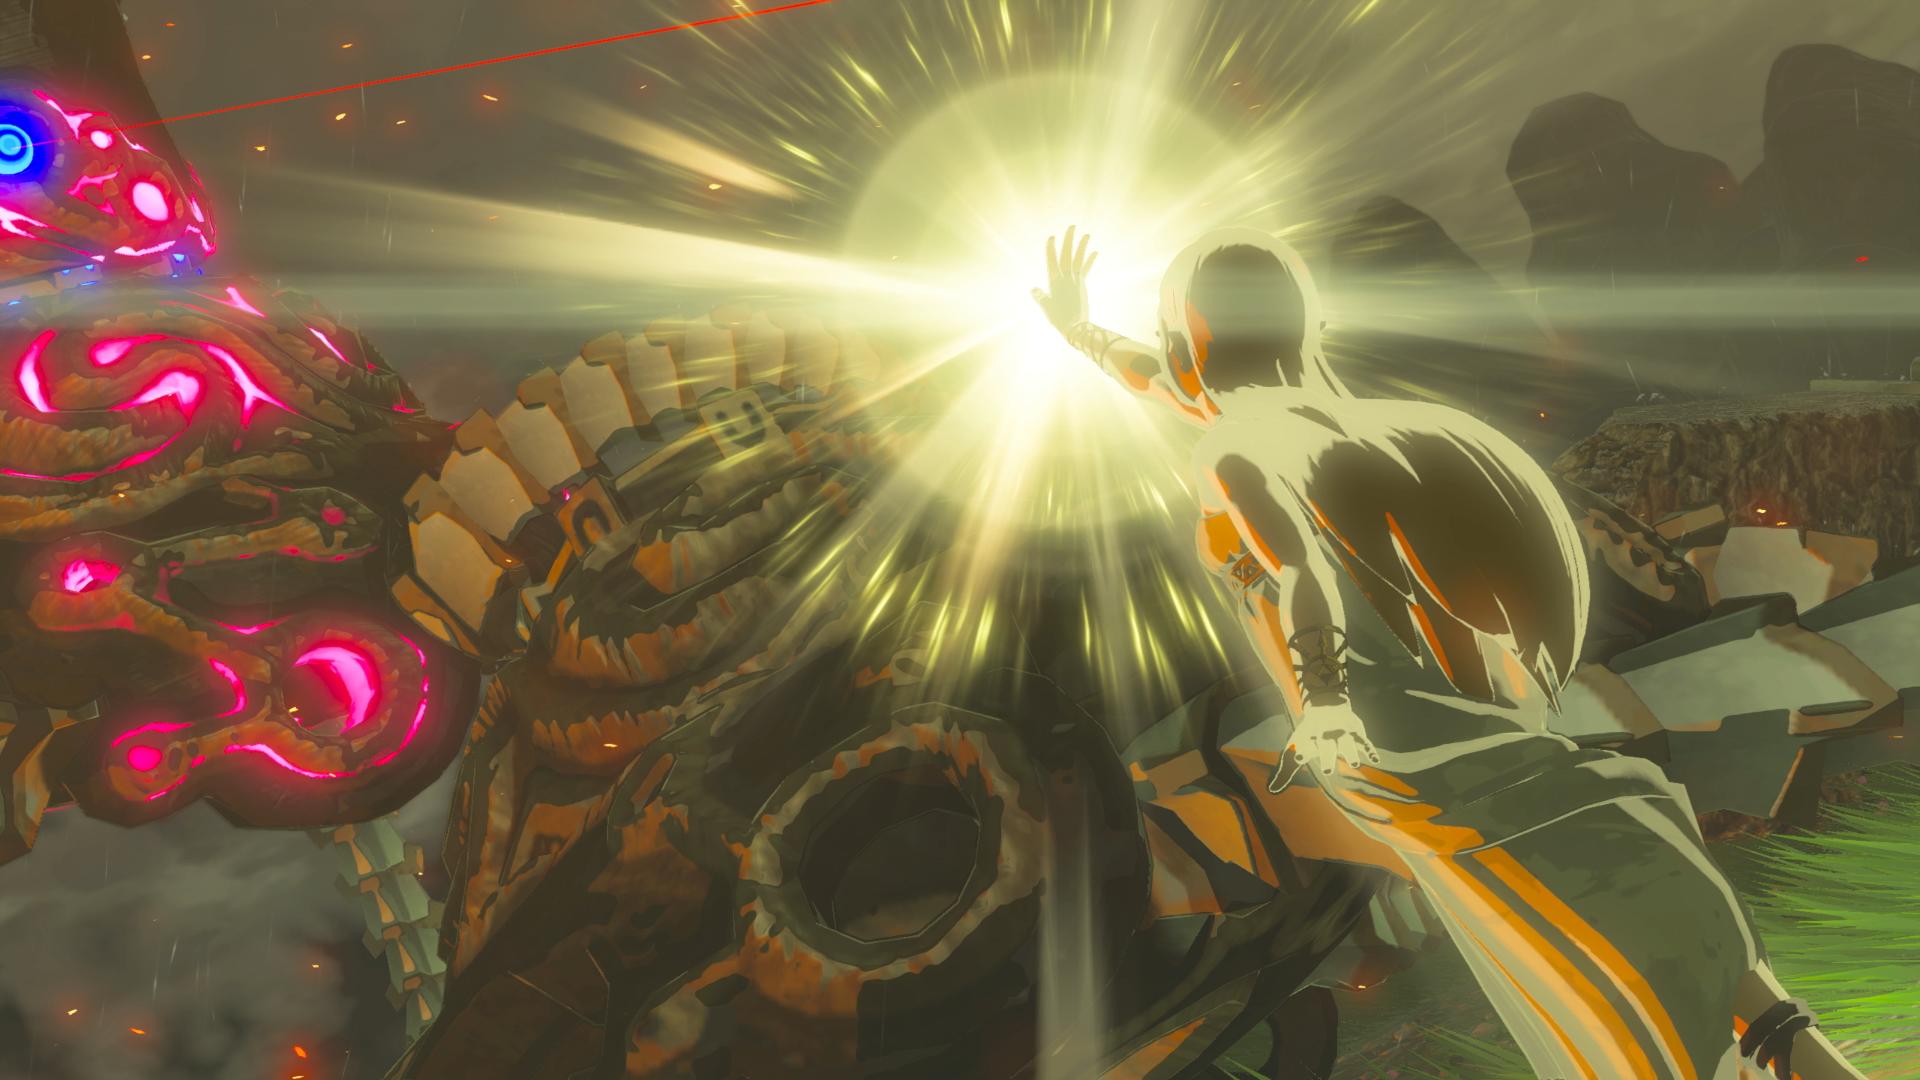 The Legend of Zelda: Breath of the Wild image 42